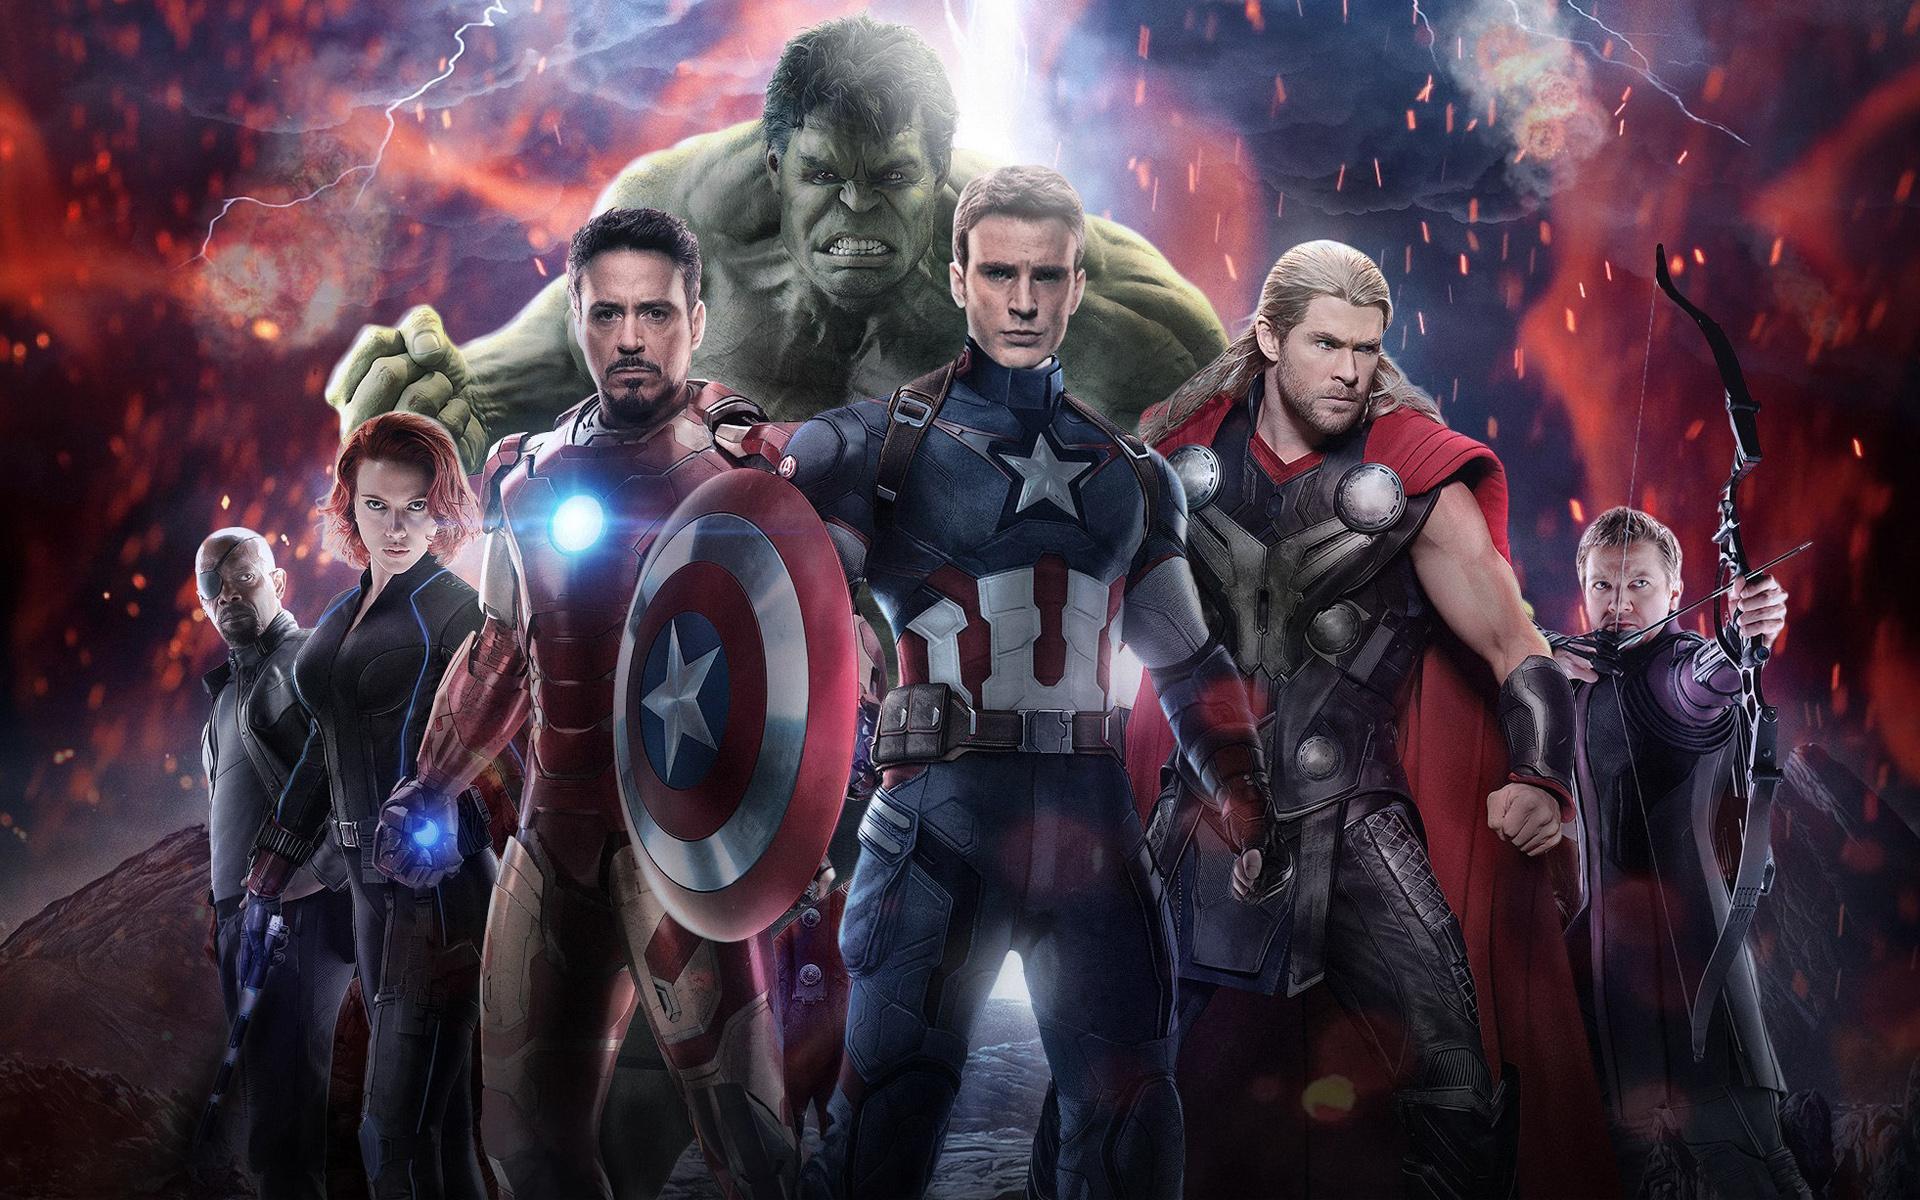 Scarlett Johansson: Black Widow, Captain America, Chris Evans, Кріс Хемсворт, Hawkeye, Hulk, Iron Man, Jeremy Renner, Robert Downey Jr., Scarlett Johansson, Thor, Дівчата, Avengers: Age of Ultron, Nick Fury, Samuel L. Jackson